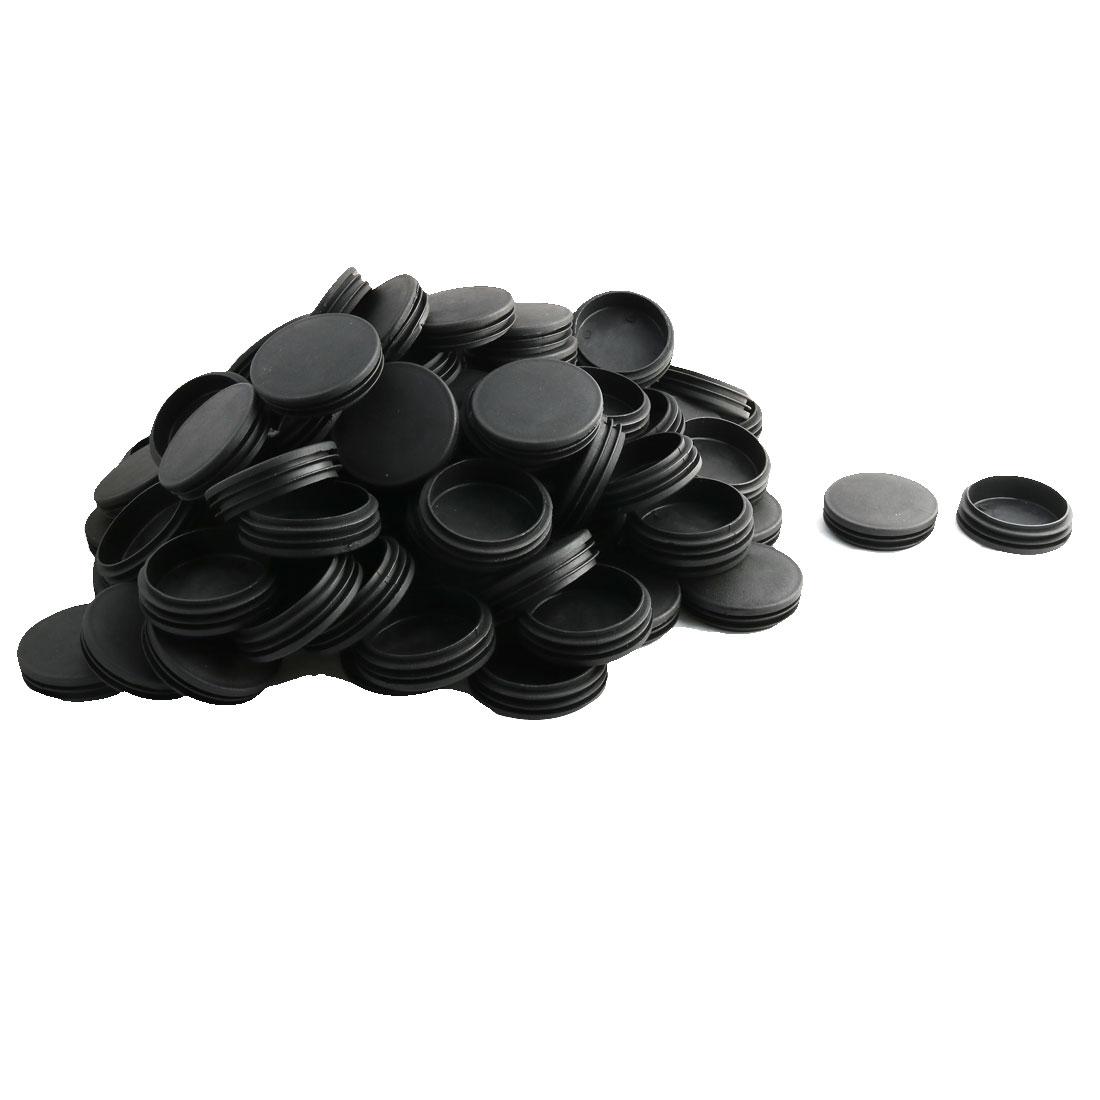 Household Office Plastic Round Furniture Legs Tube Insert Black Dia 70mm 100 Pcs